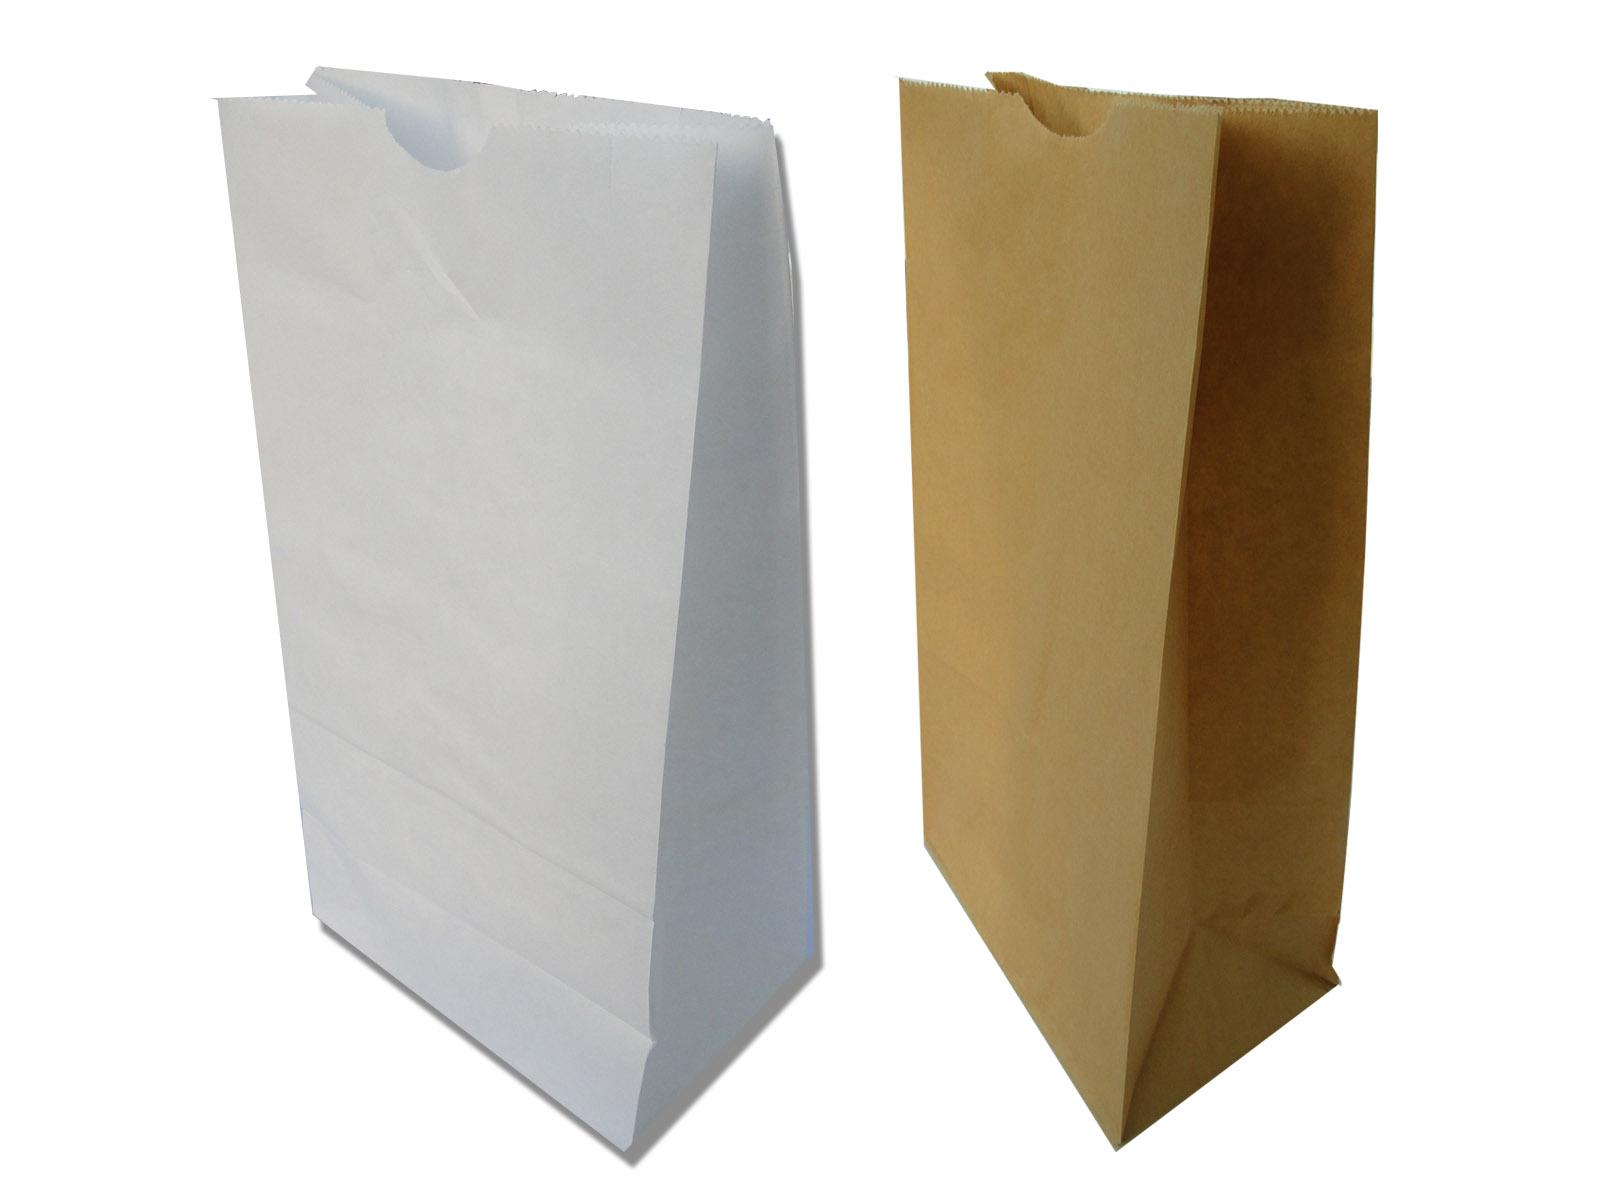 plasticcontainer com my paper bag paper bag base or brown paper bag wedding paper bag